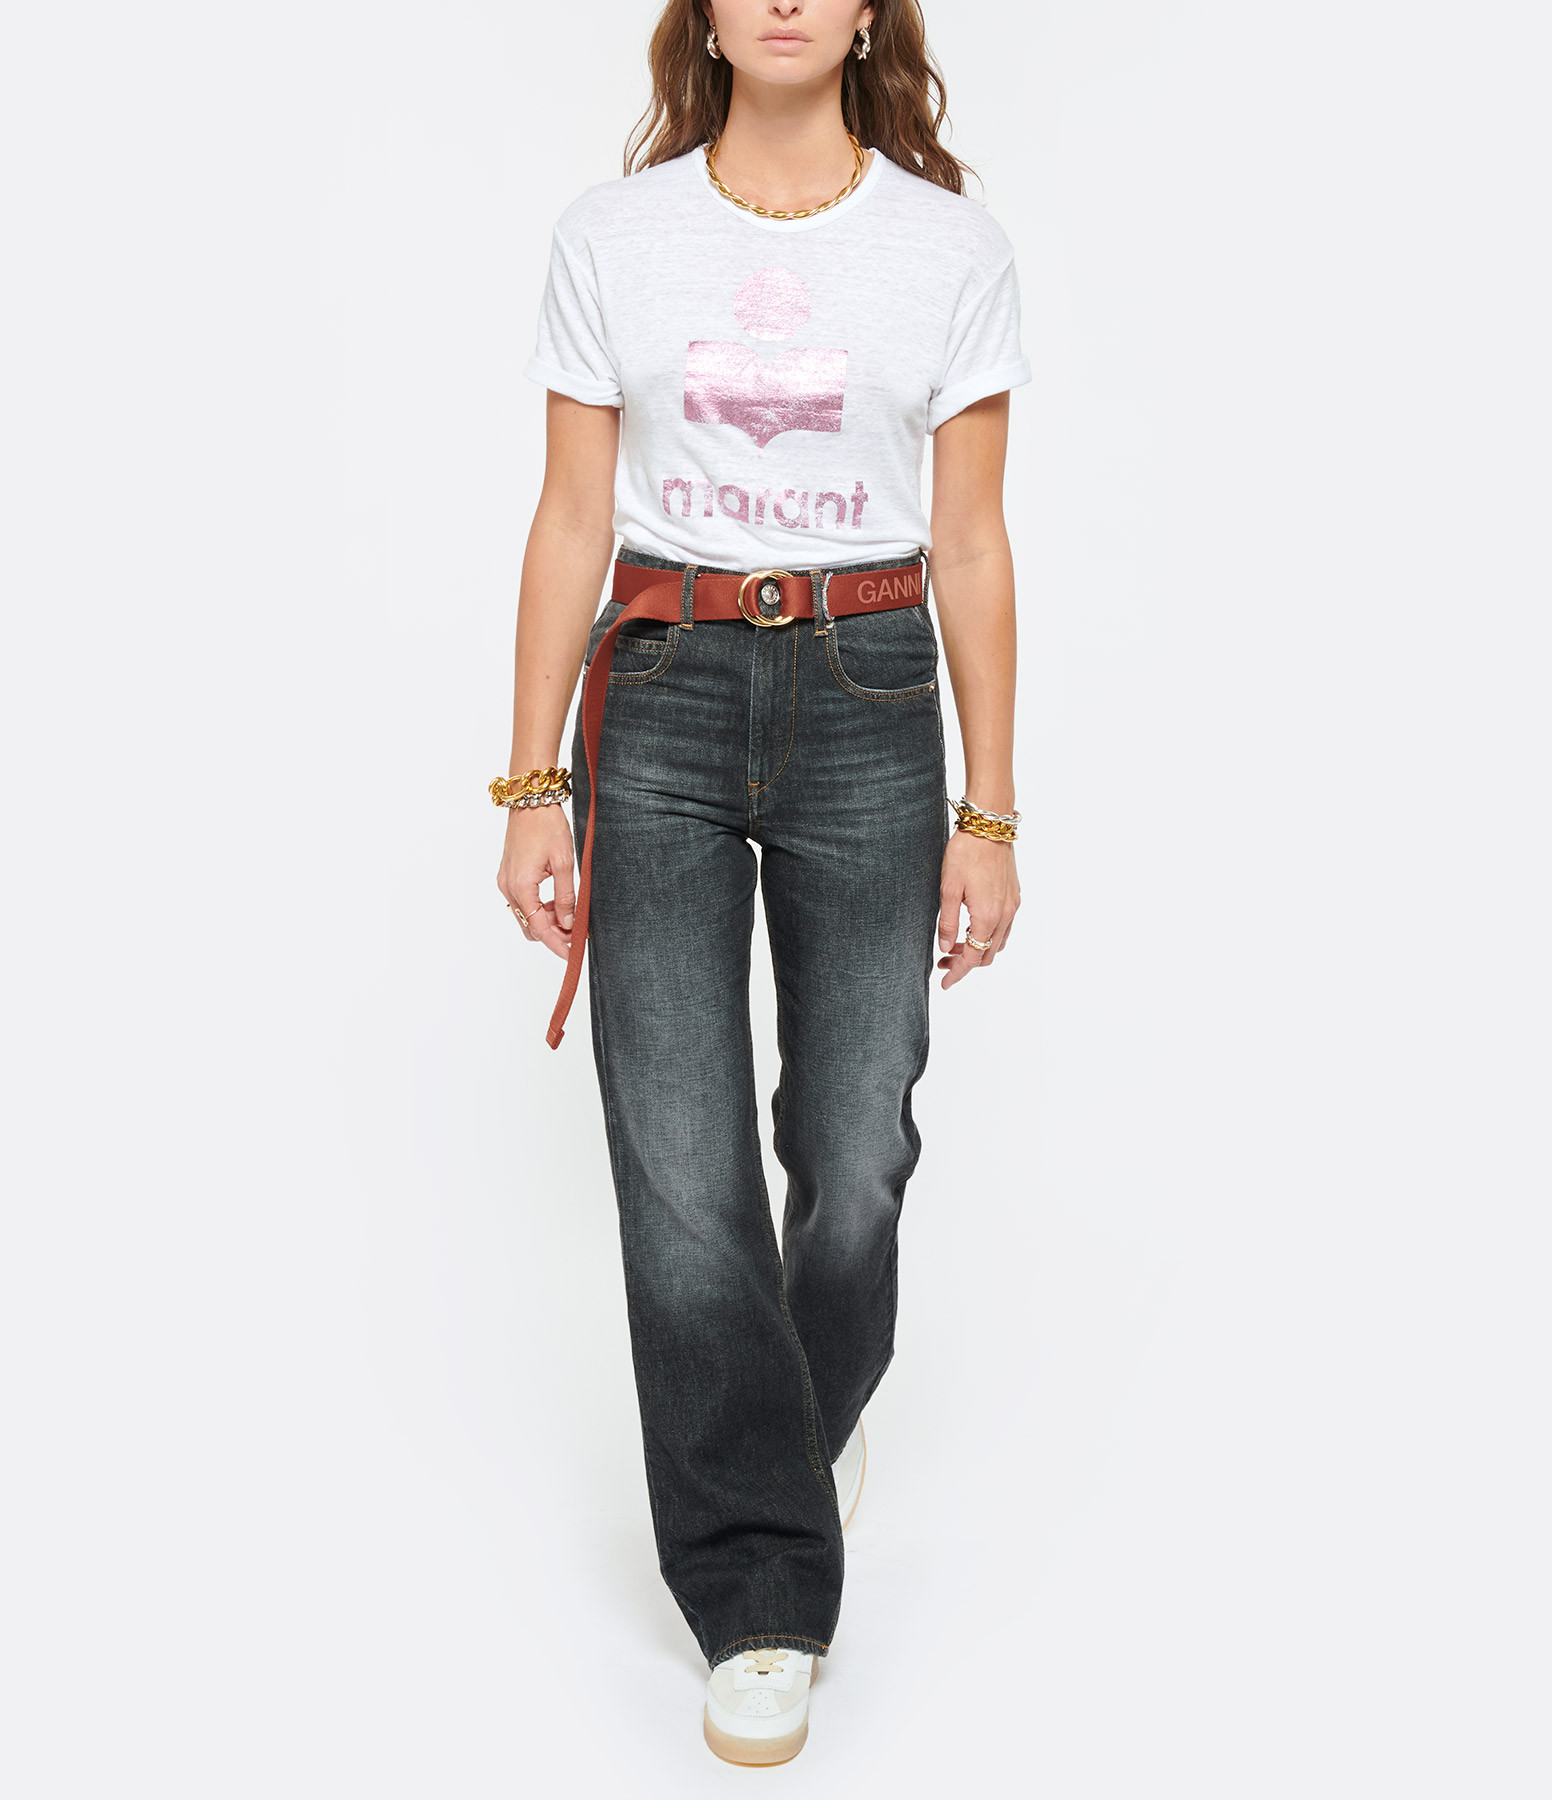 ISABEL MARANT ÉTOILE - Tee-shirt Koldi Lin Blanc Rose